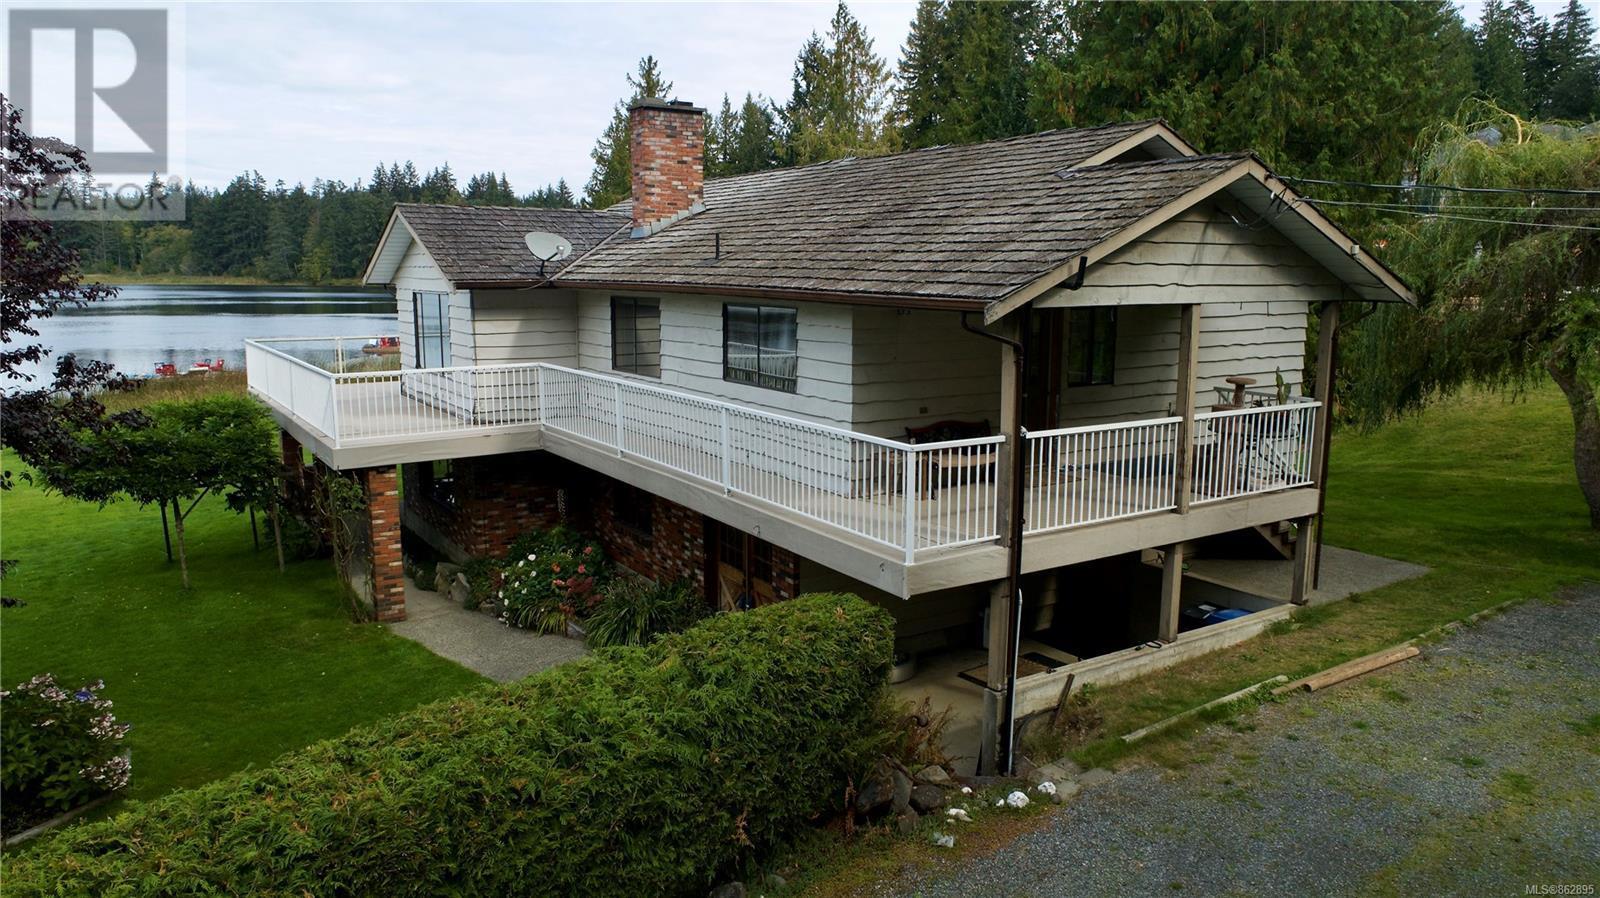 6690 Jenkins Rd, Nanaimo, British Columbia  V9T 6G8 - Photo 38 - 862895